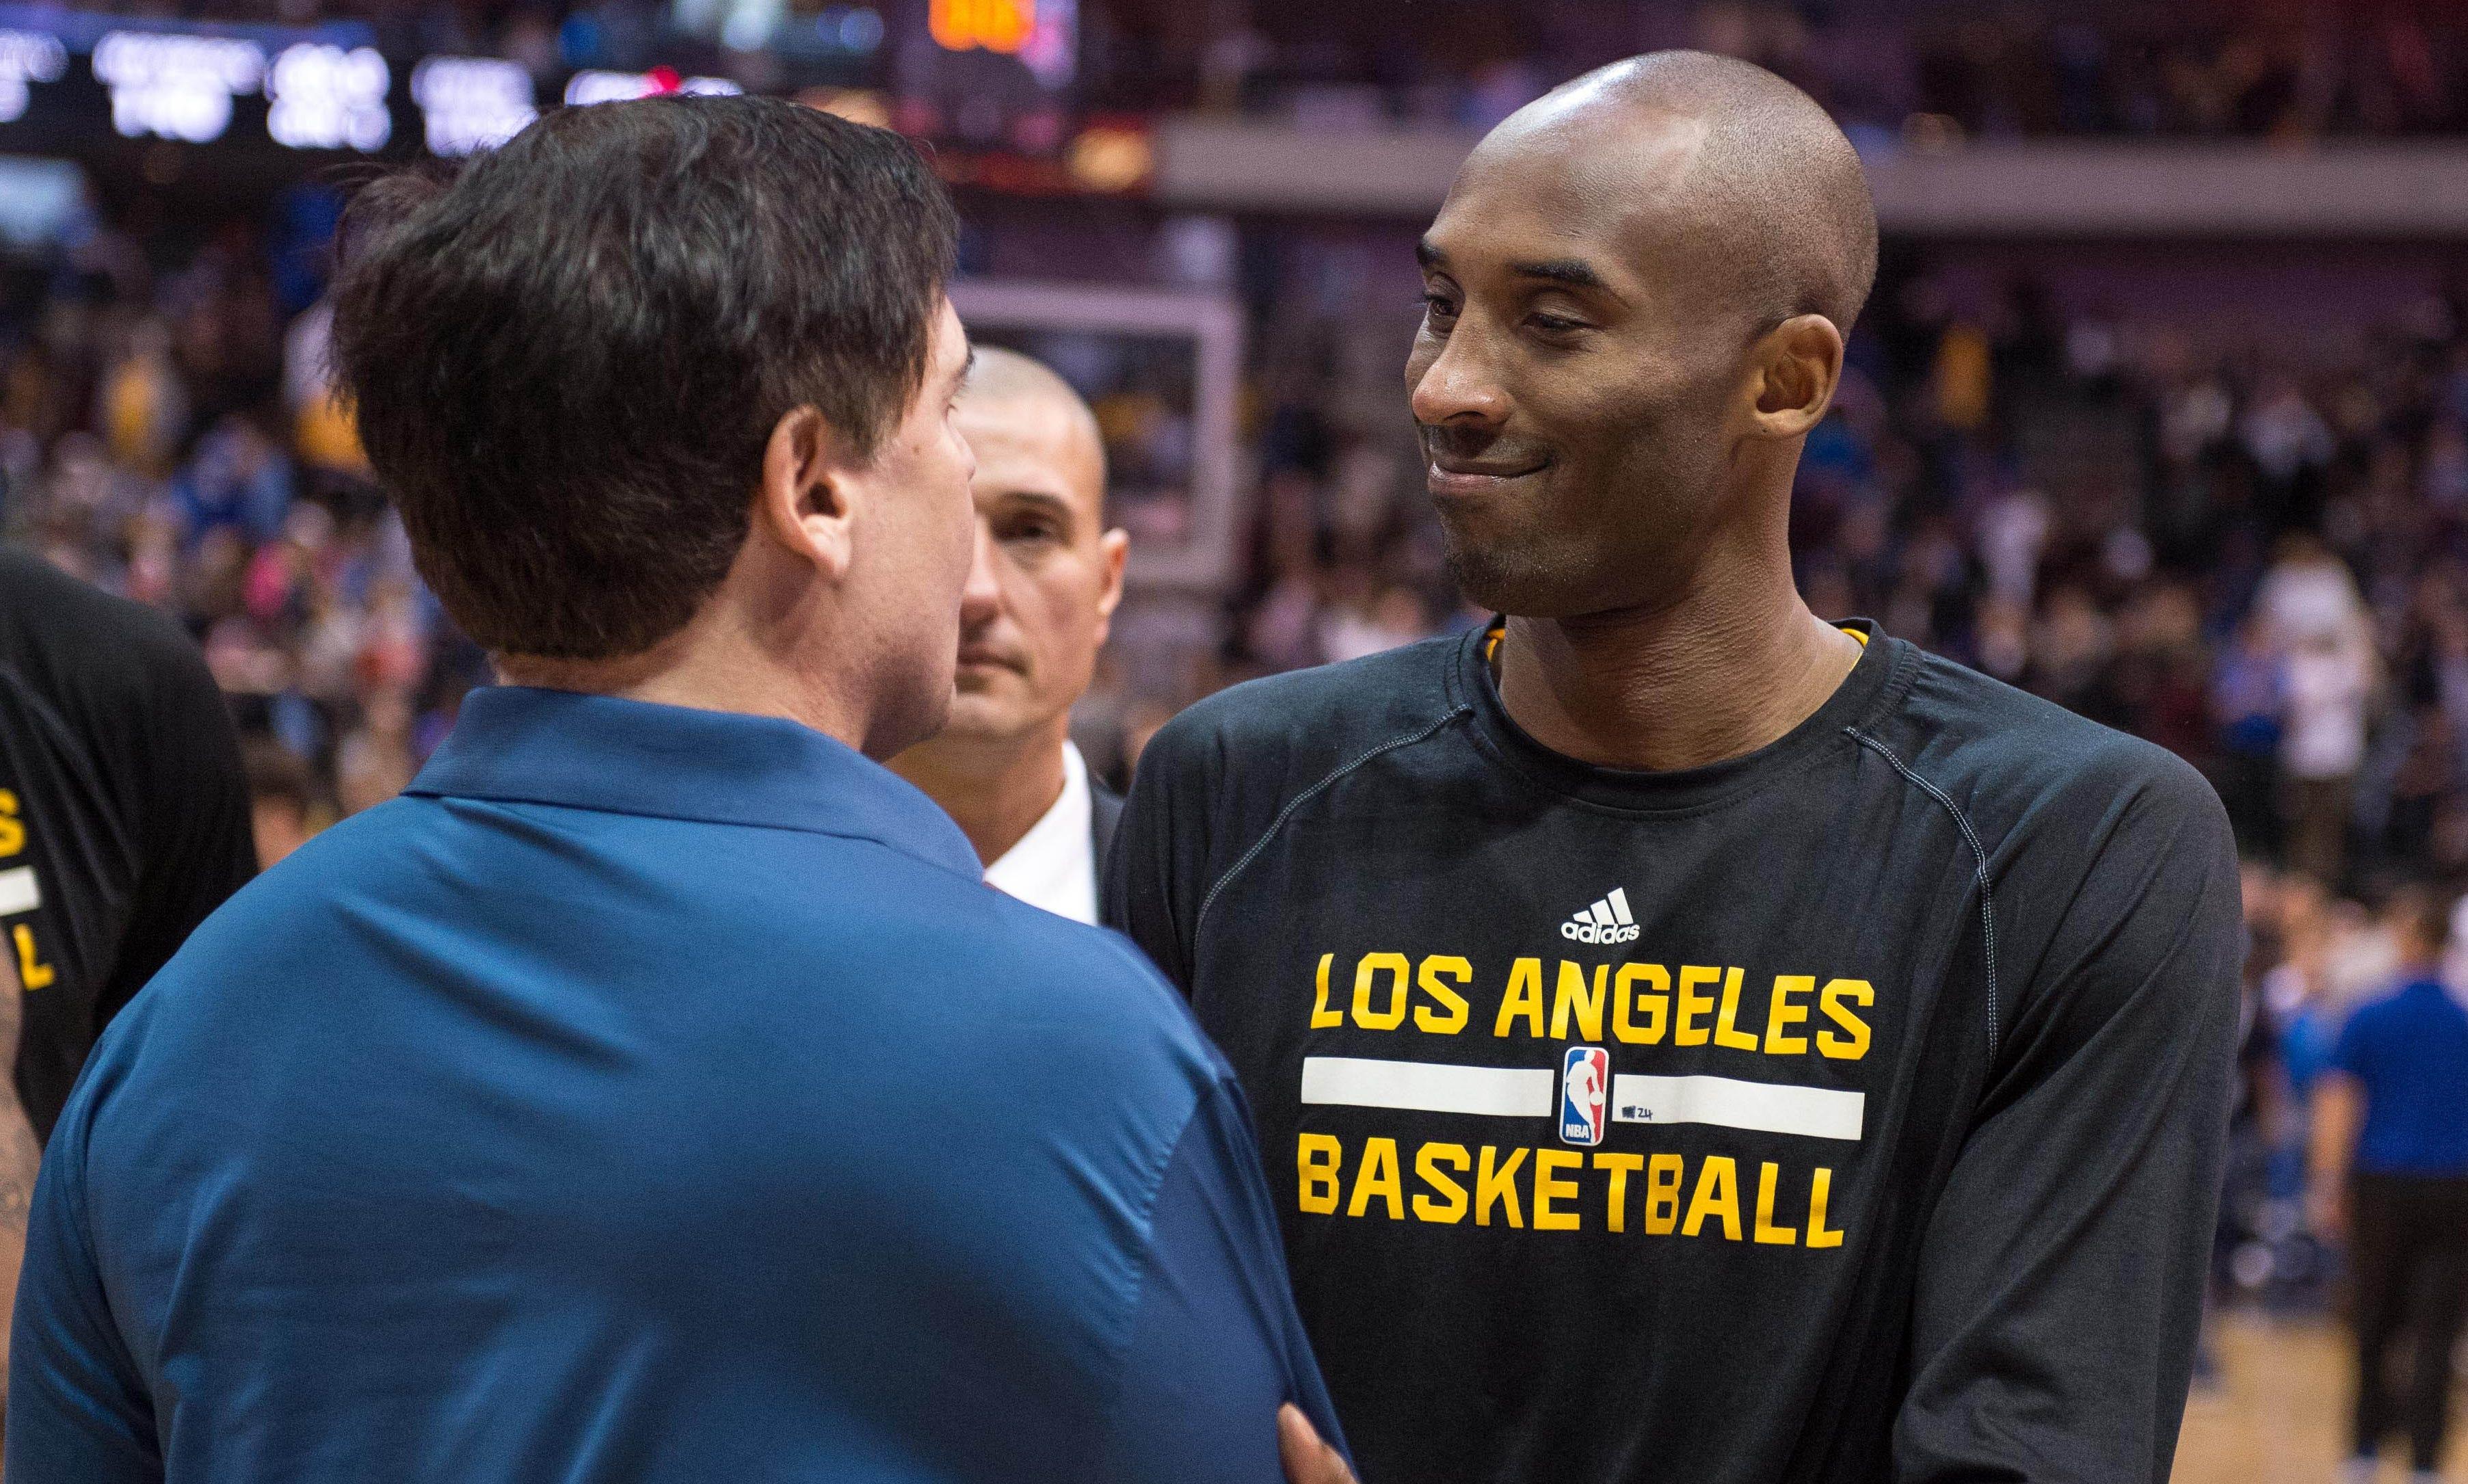 Cuban後悔終生:07年湖人都同意交易Kobe,誰知道Logo男找Kobe聊天,然後就沒有然後了!-黑特籃球-NBA新聞影音圖片分享社區